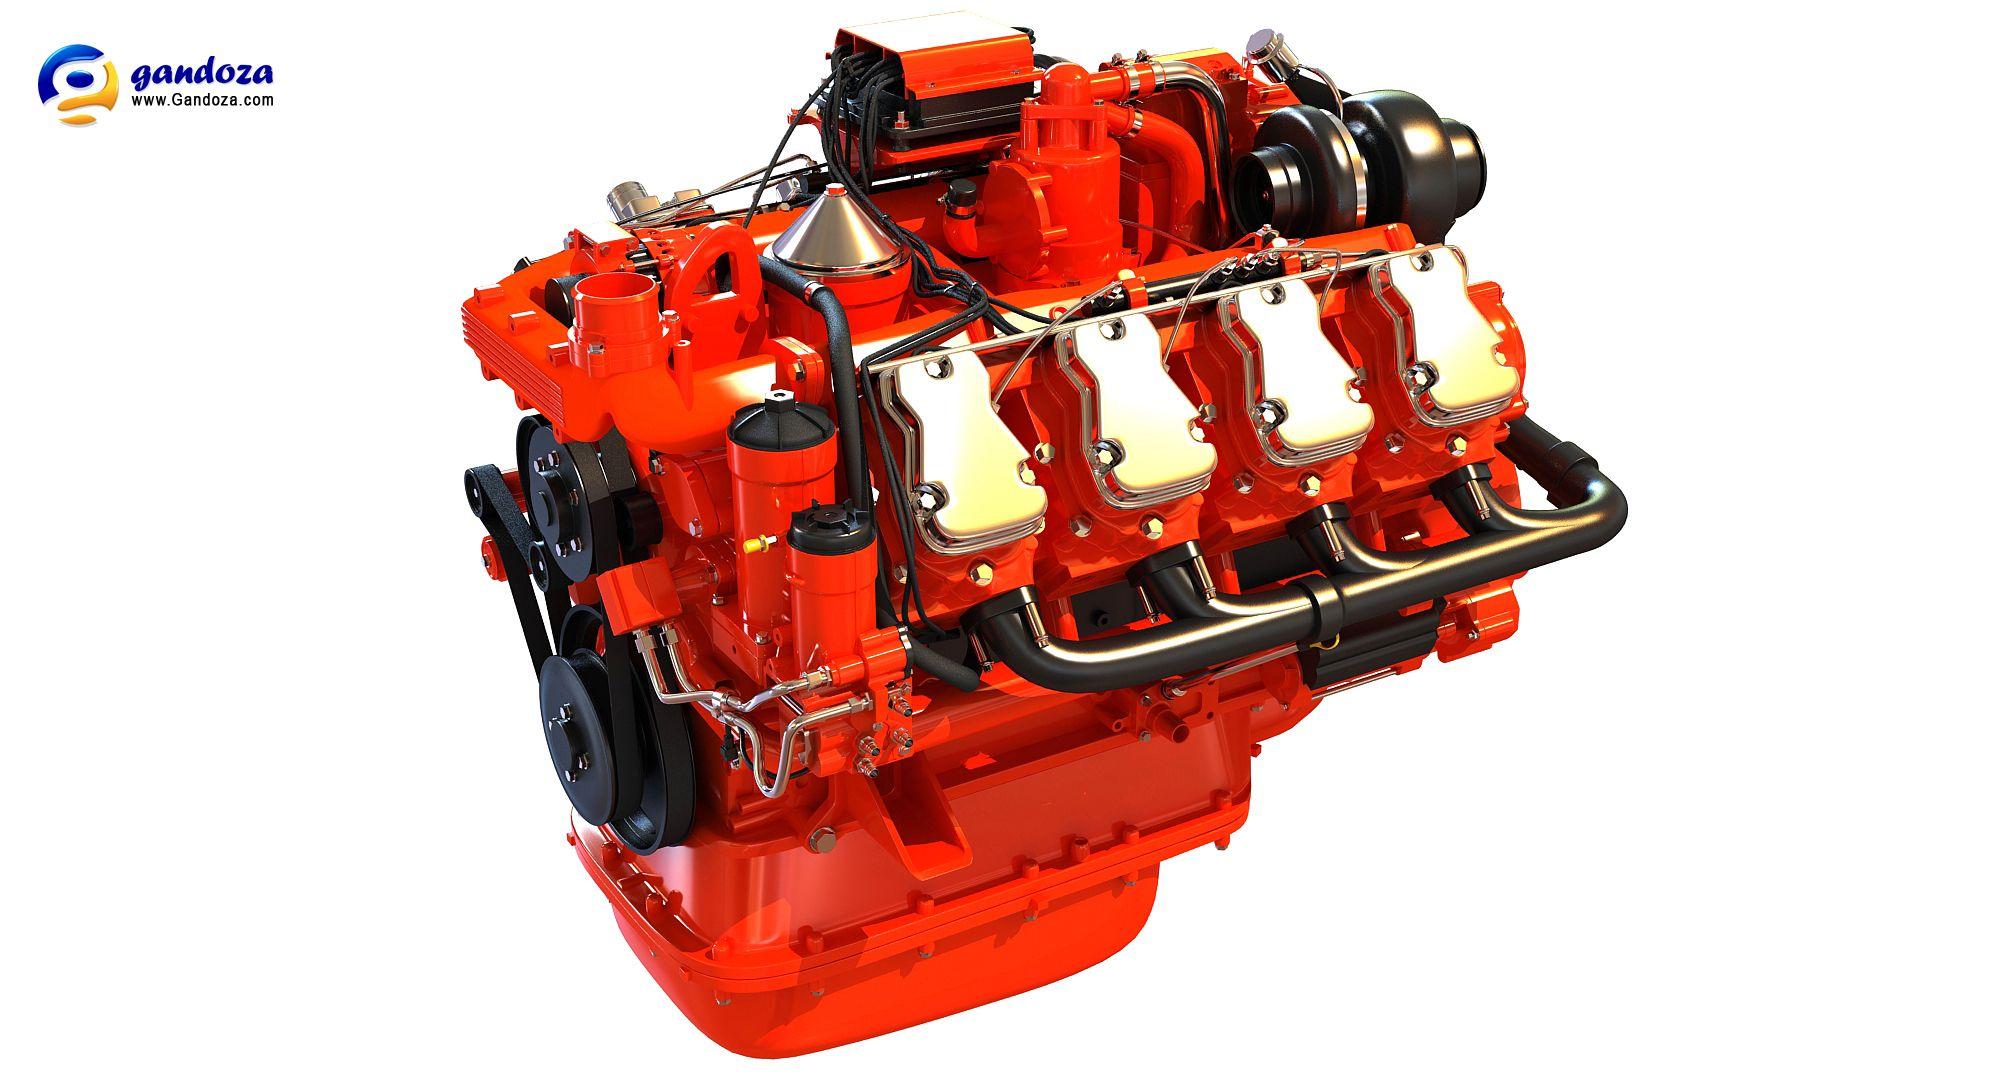 gandoza 3d and engine rh pinterest com